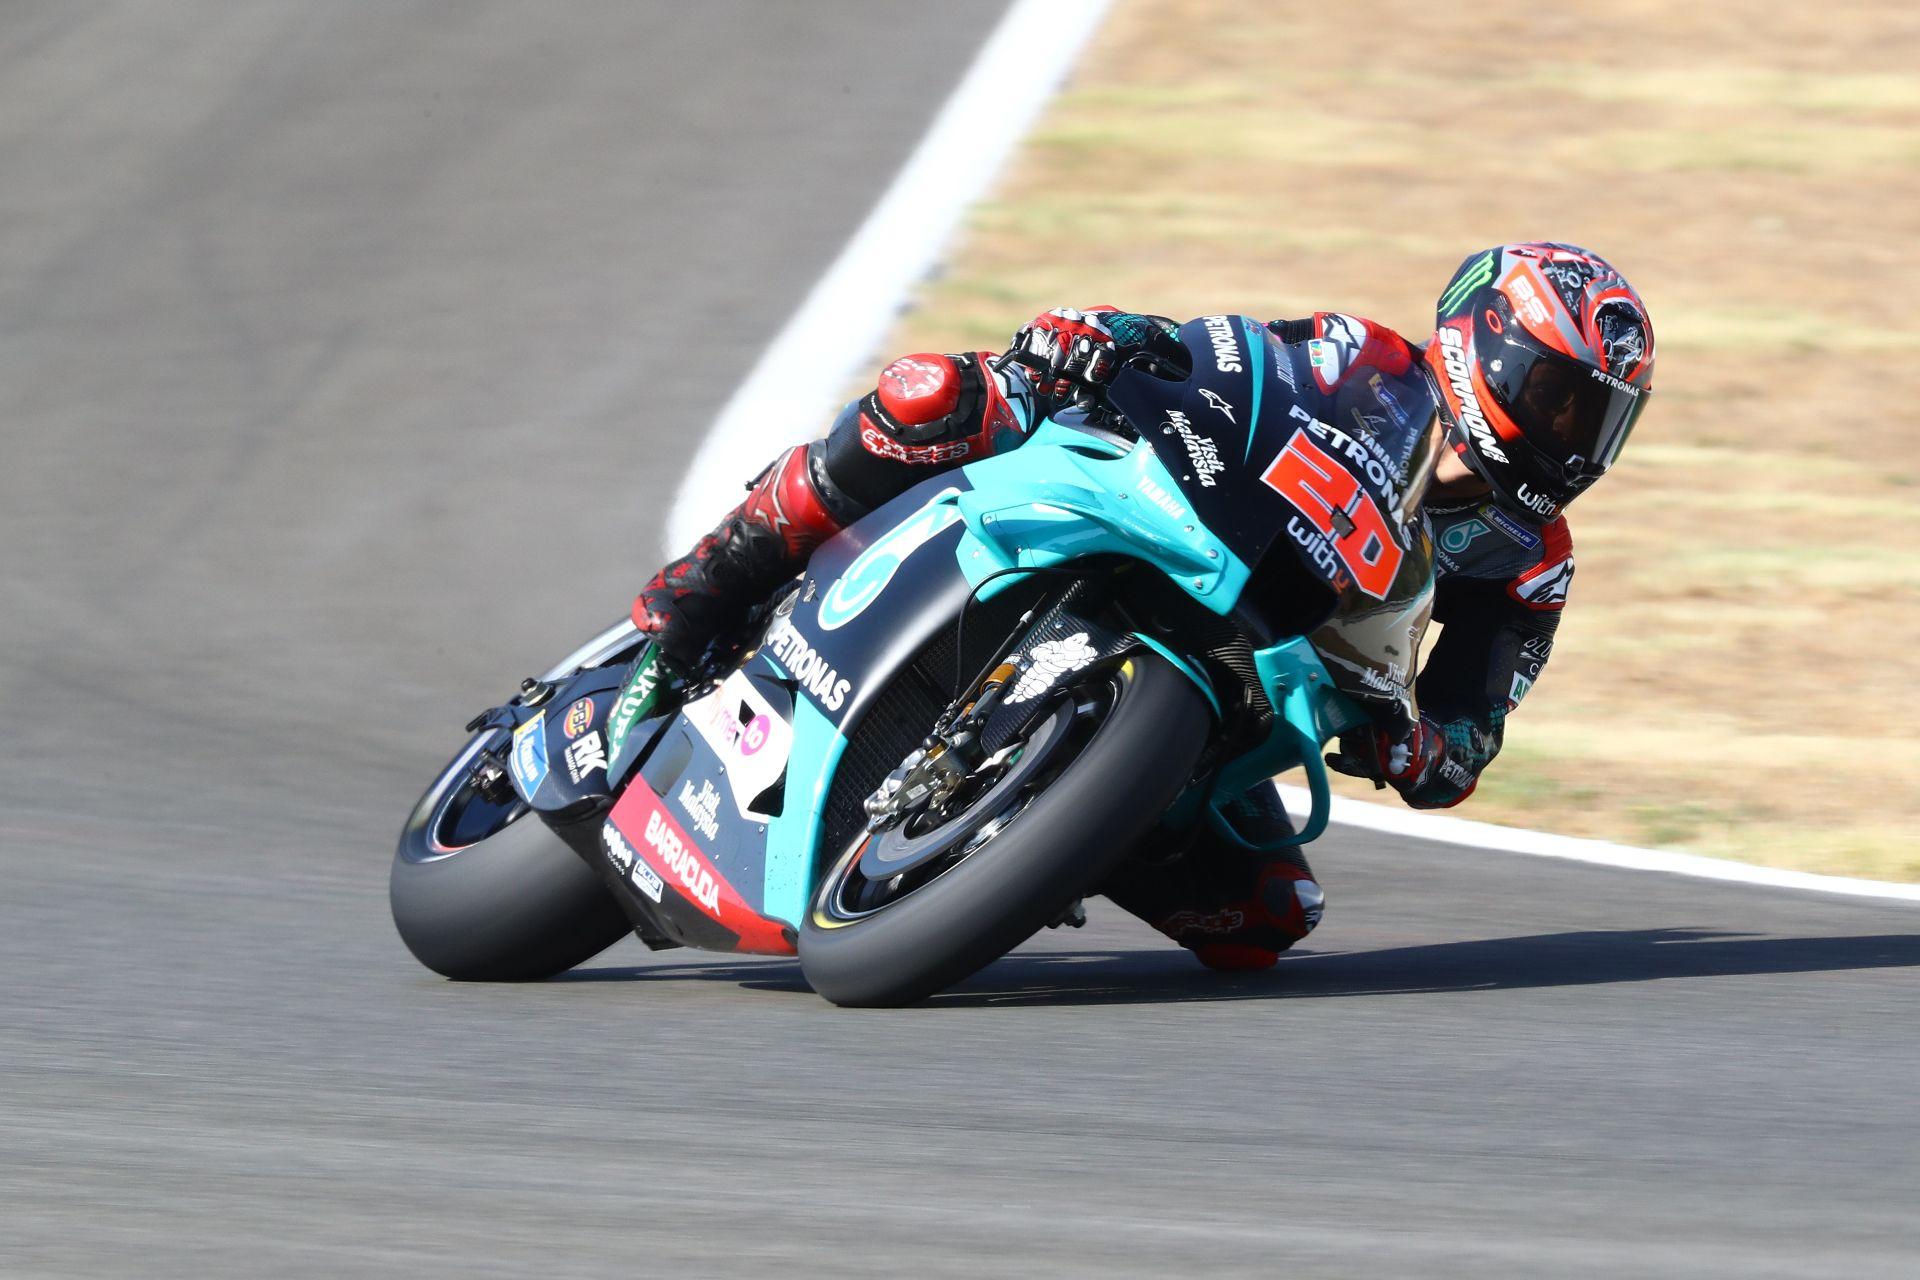 First 2020 Motogp Pole Position For Fabio Quartararo